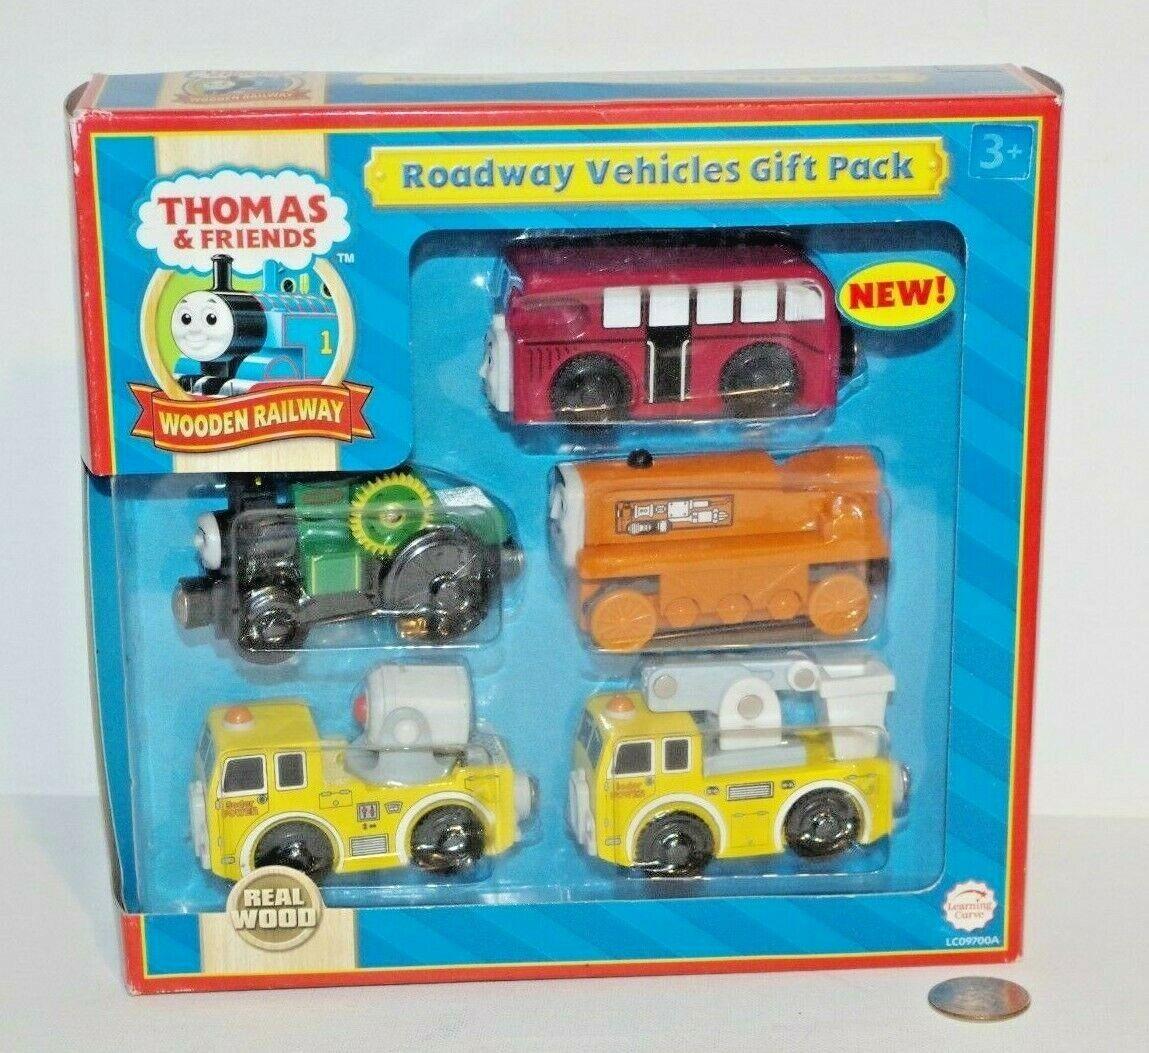 Thomas & Friends Friends Wooden Railway Train Tank Engine NEW Roadway Vehicles Gift Pack